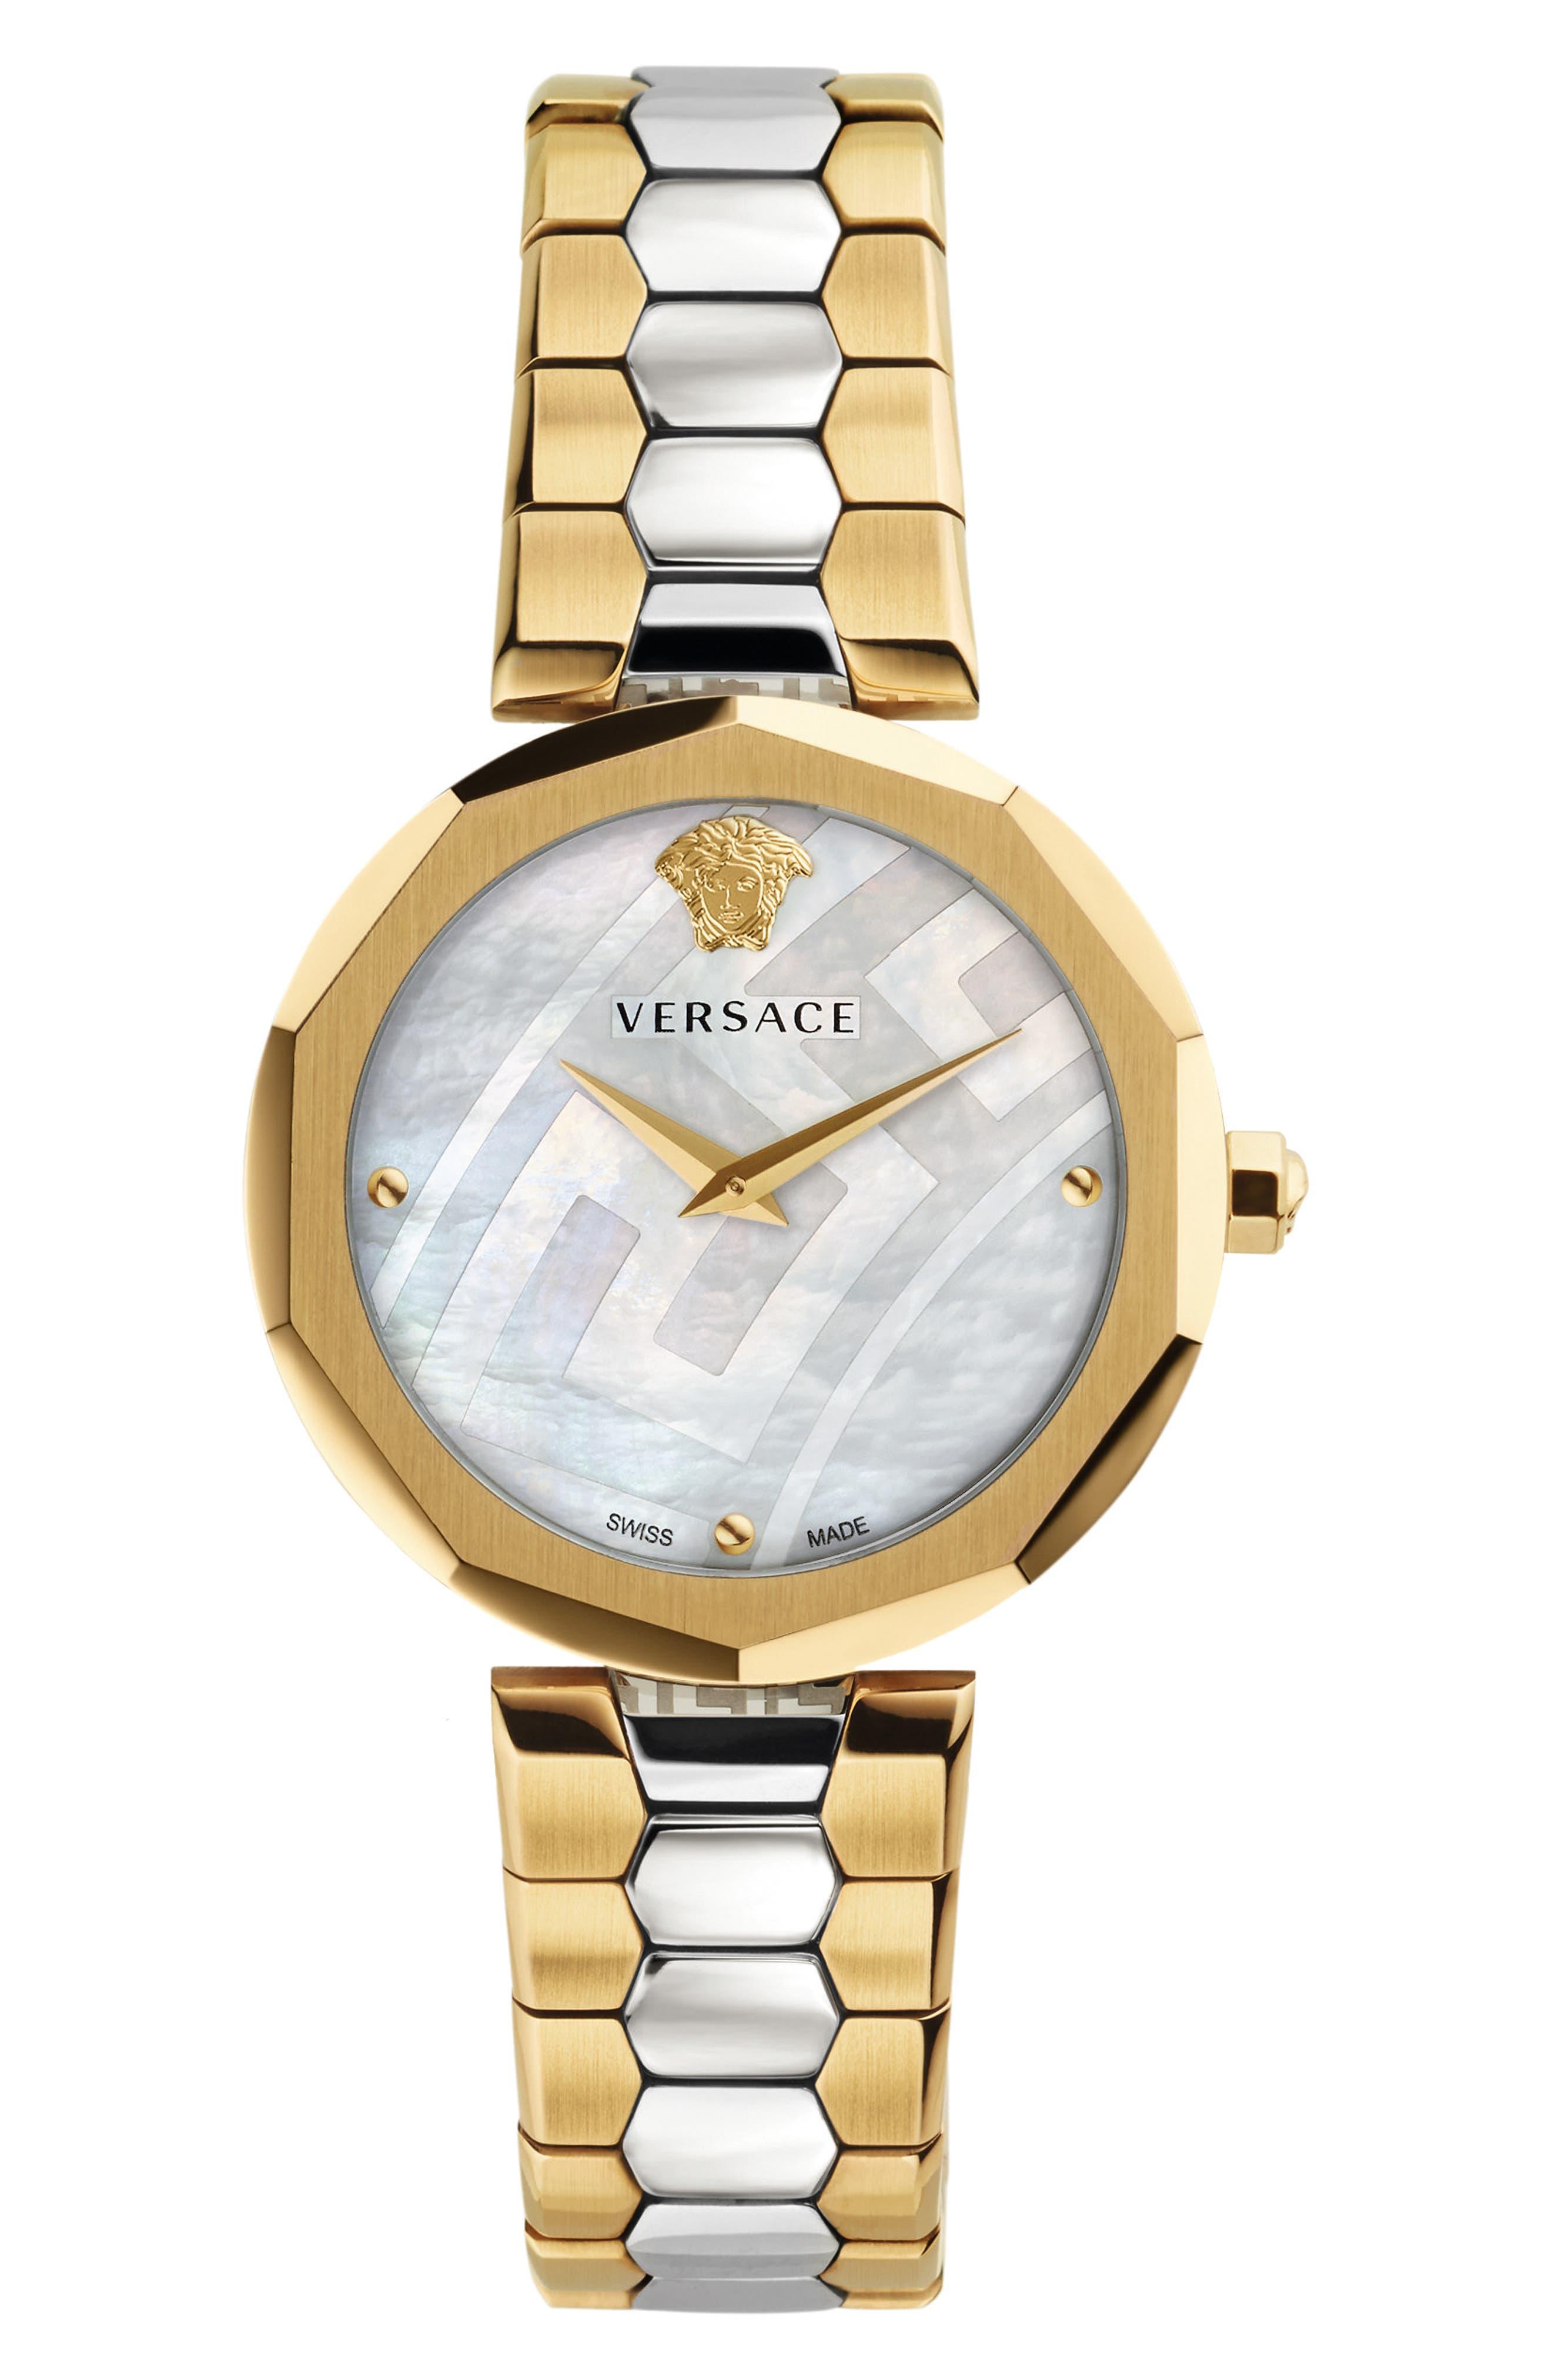 VERSACE, Idyia Bracelet Watch, 36mm, Main thumbnail 1, color, SILVER/ MOP/ GOLD